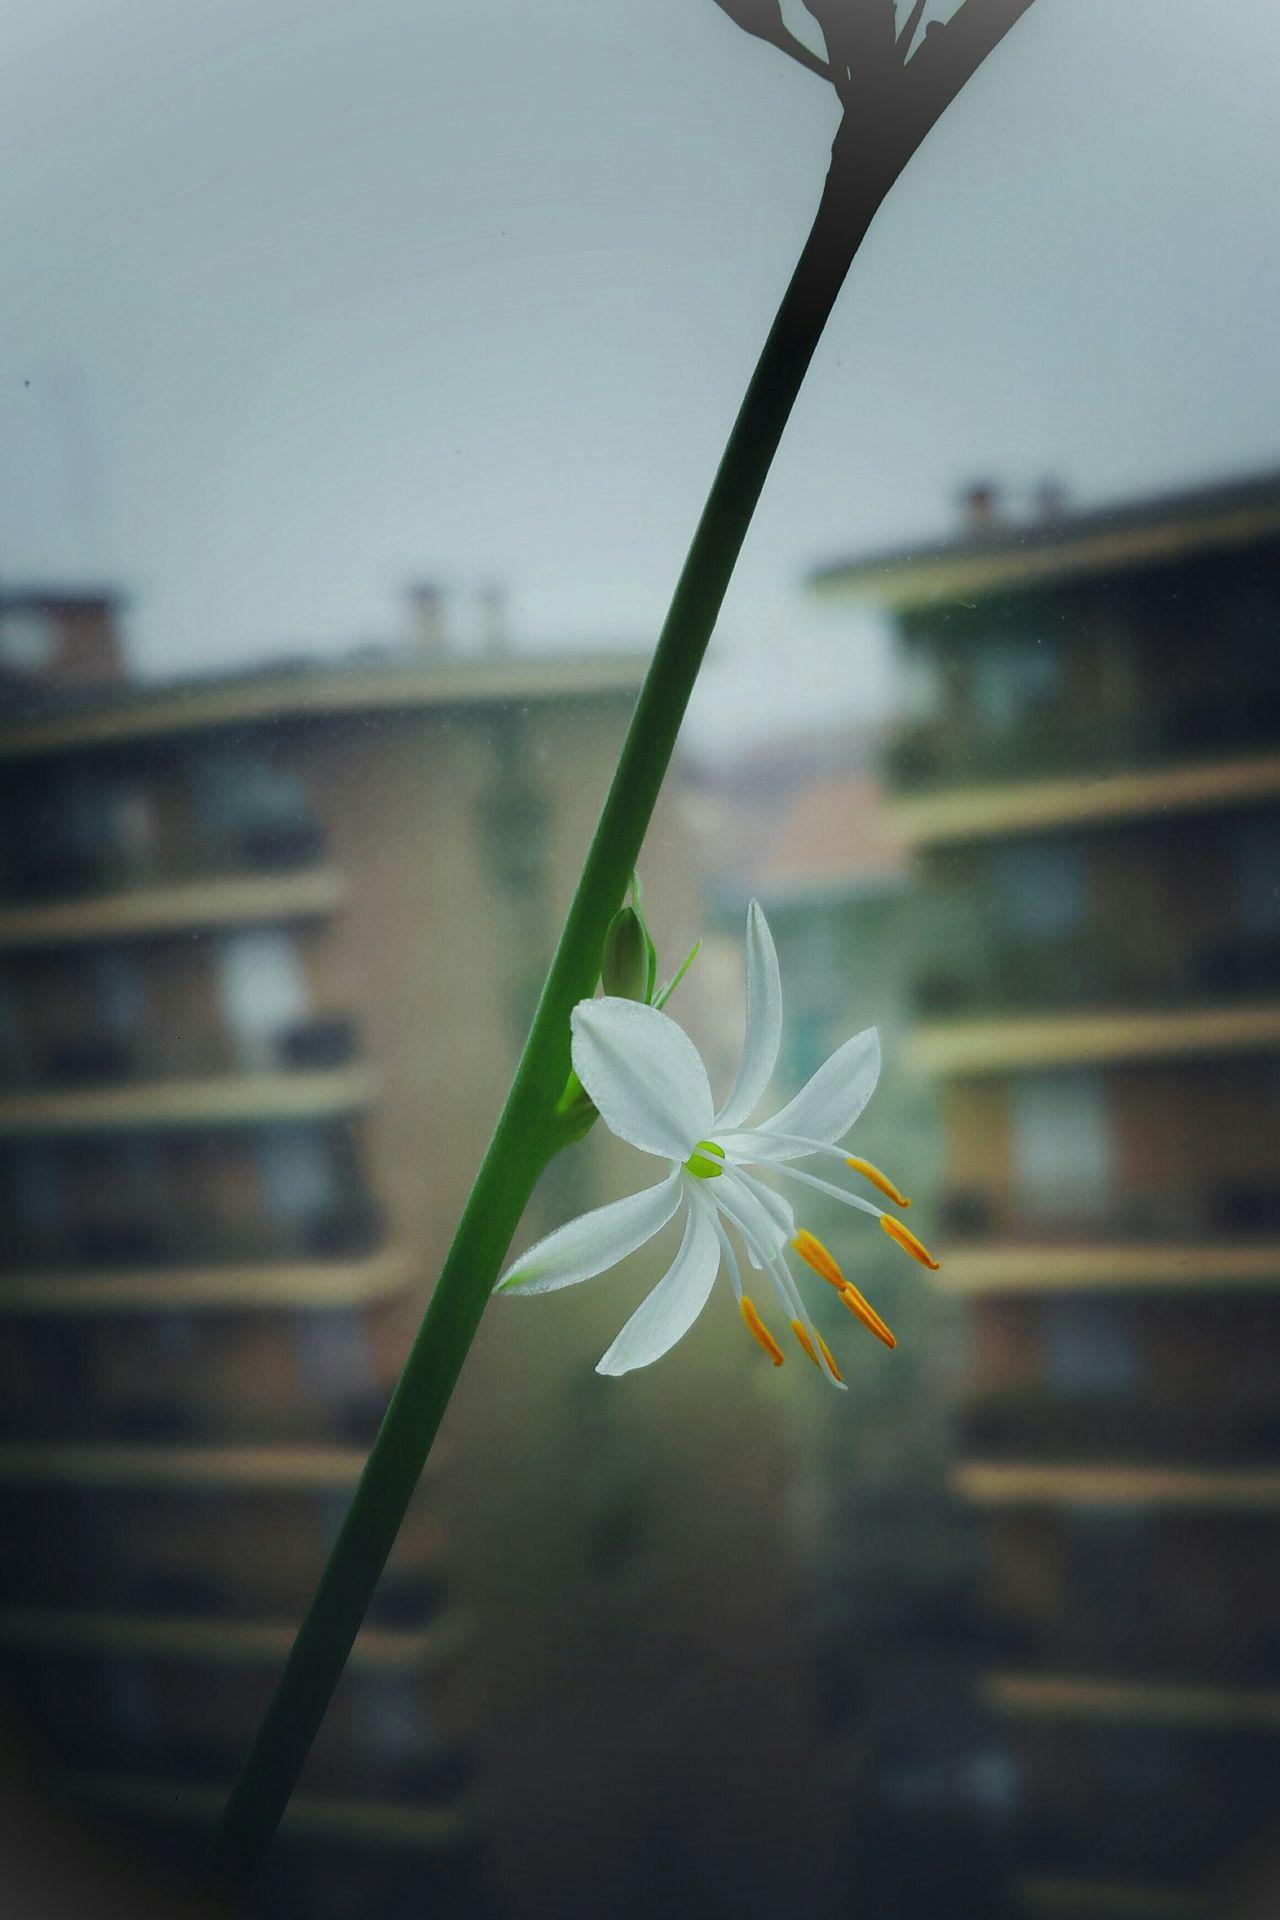 Winter Flowers Winter Blooms Fiorire d'inverno